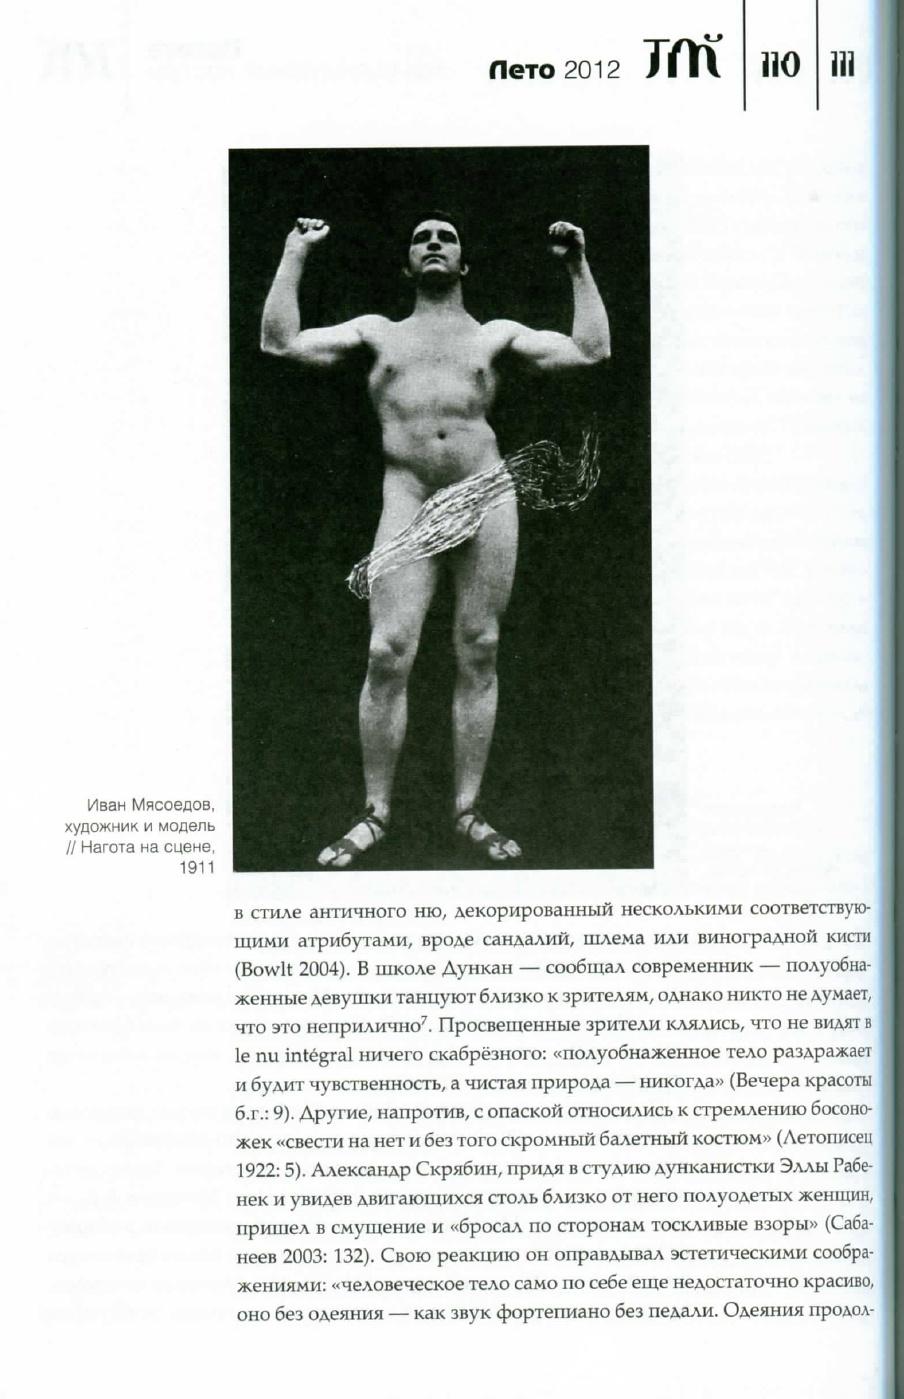 http://s3.uploads.ru/StcKF.jpg